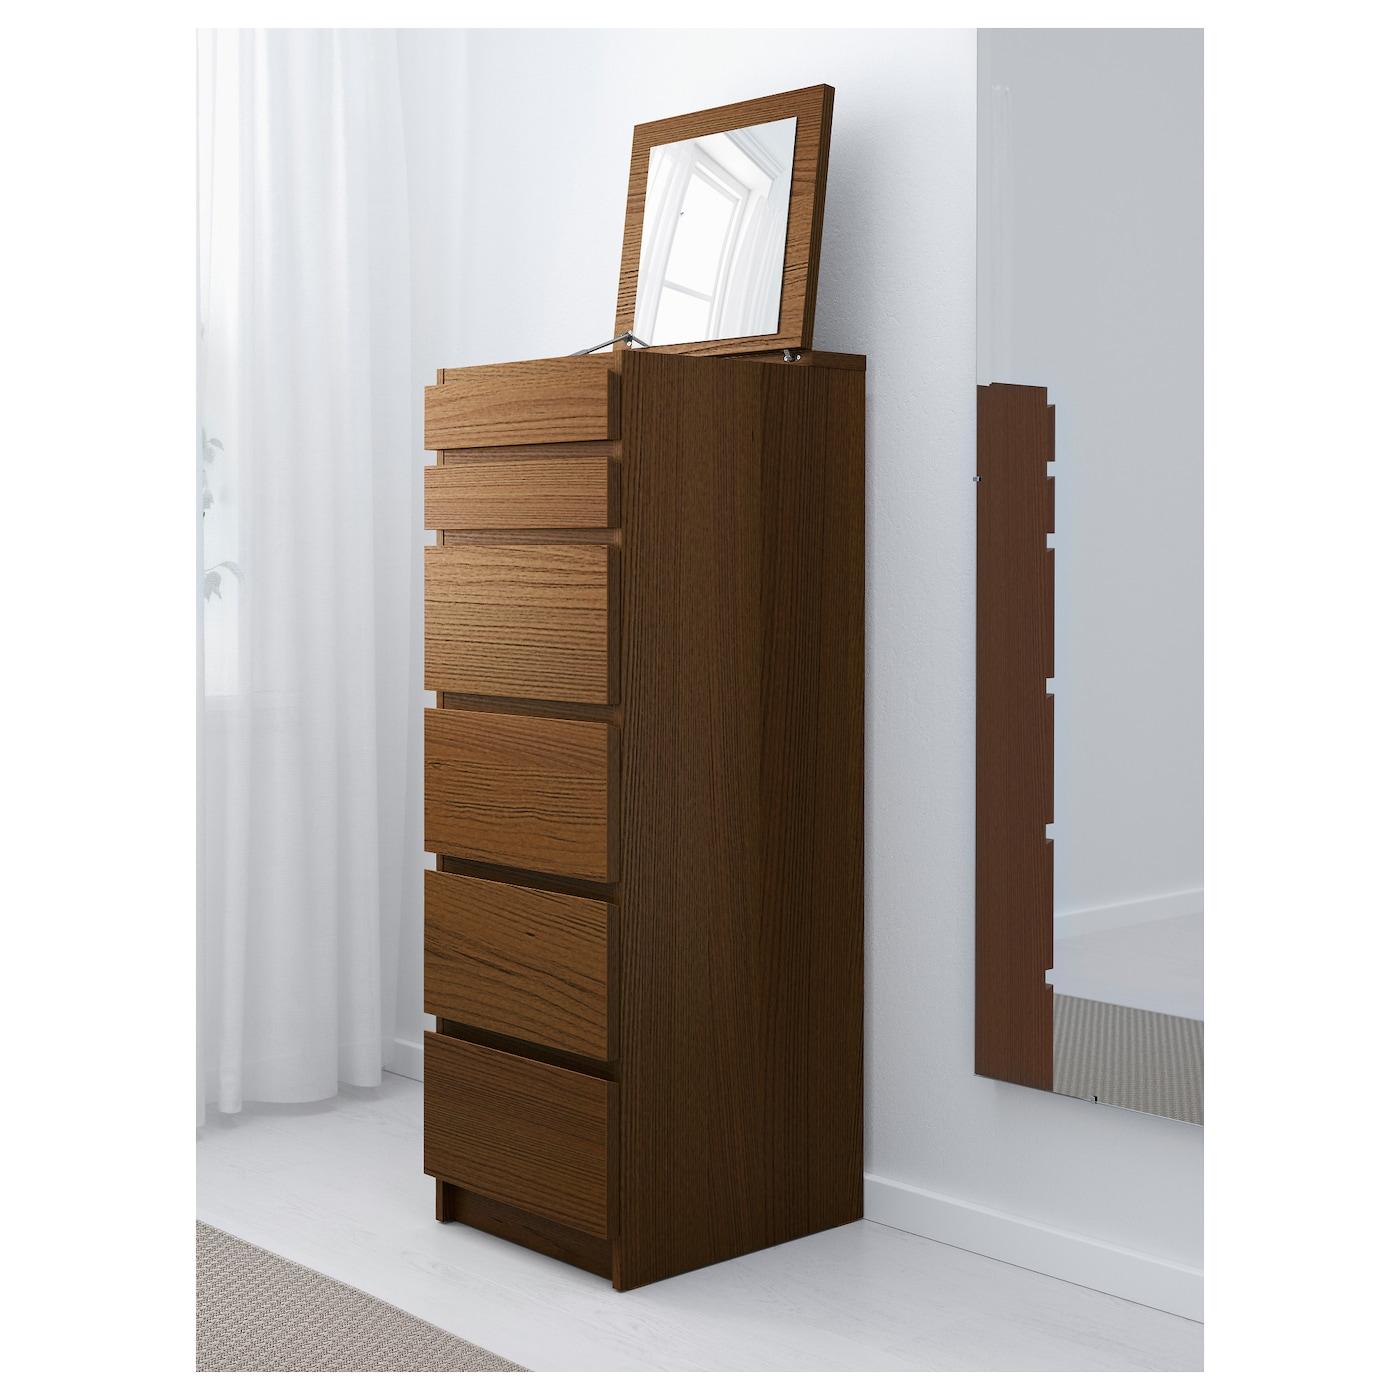 malm ladekast met 6 lades bruin gelazuurd essenfineer spiegelglas 40 x 123 cm ikea. Black Bedroom Furniture Sets. Home Design Ideas